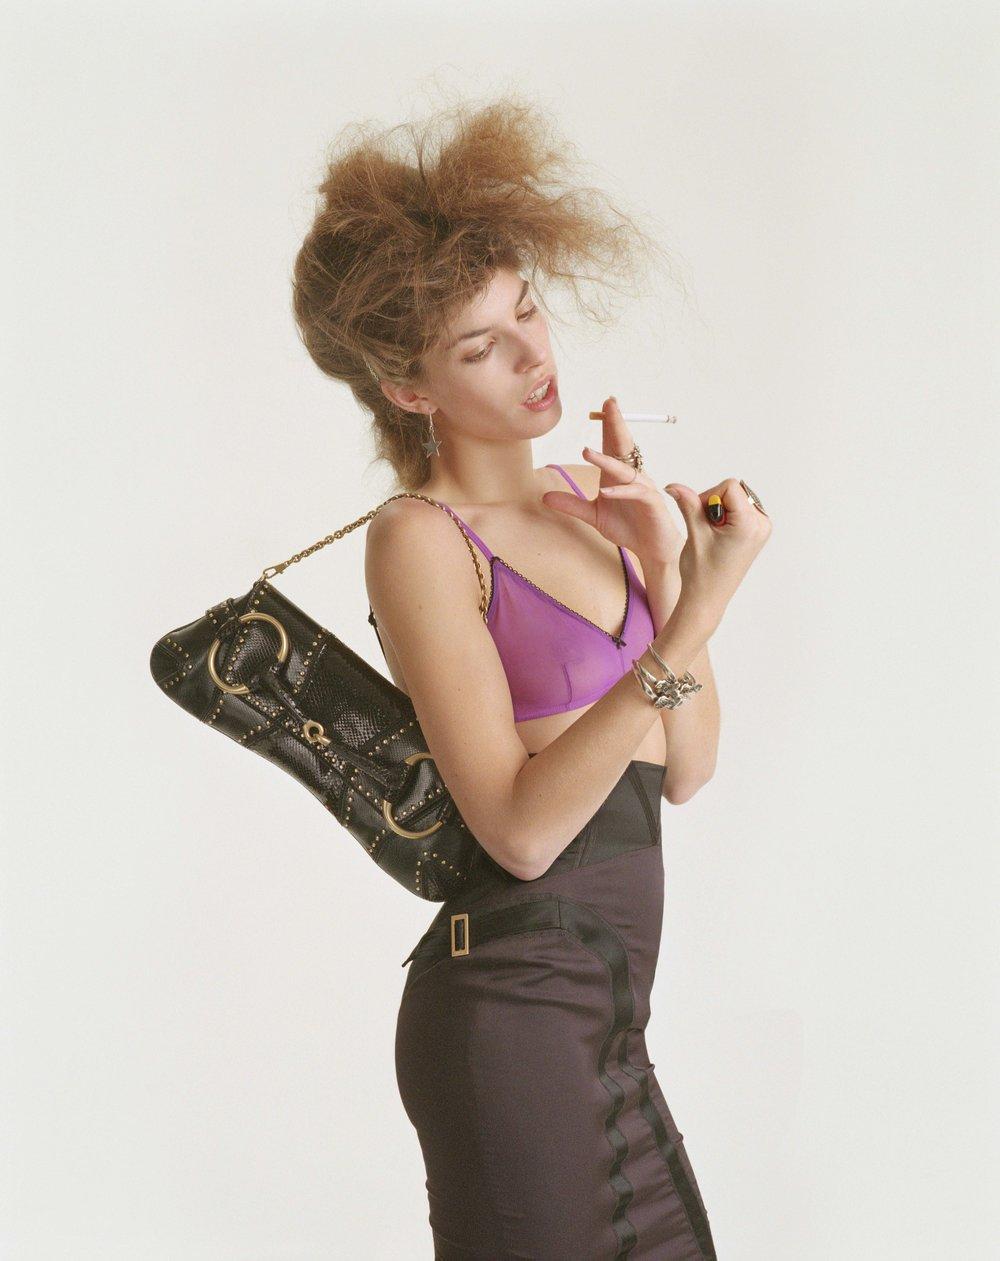 Vogue Italia-10_v1 pri#8A08.jpg